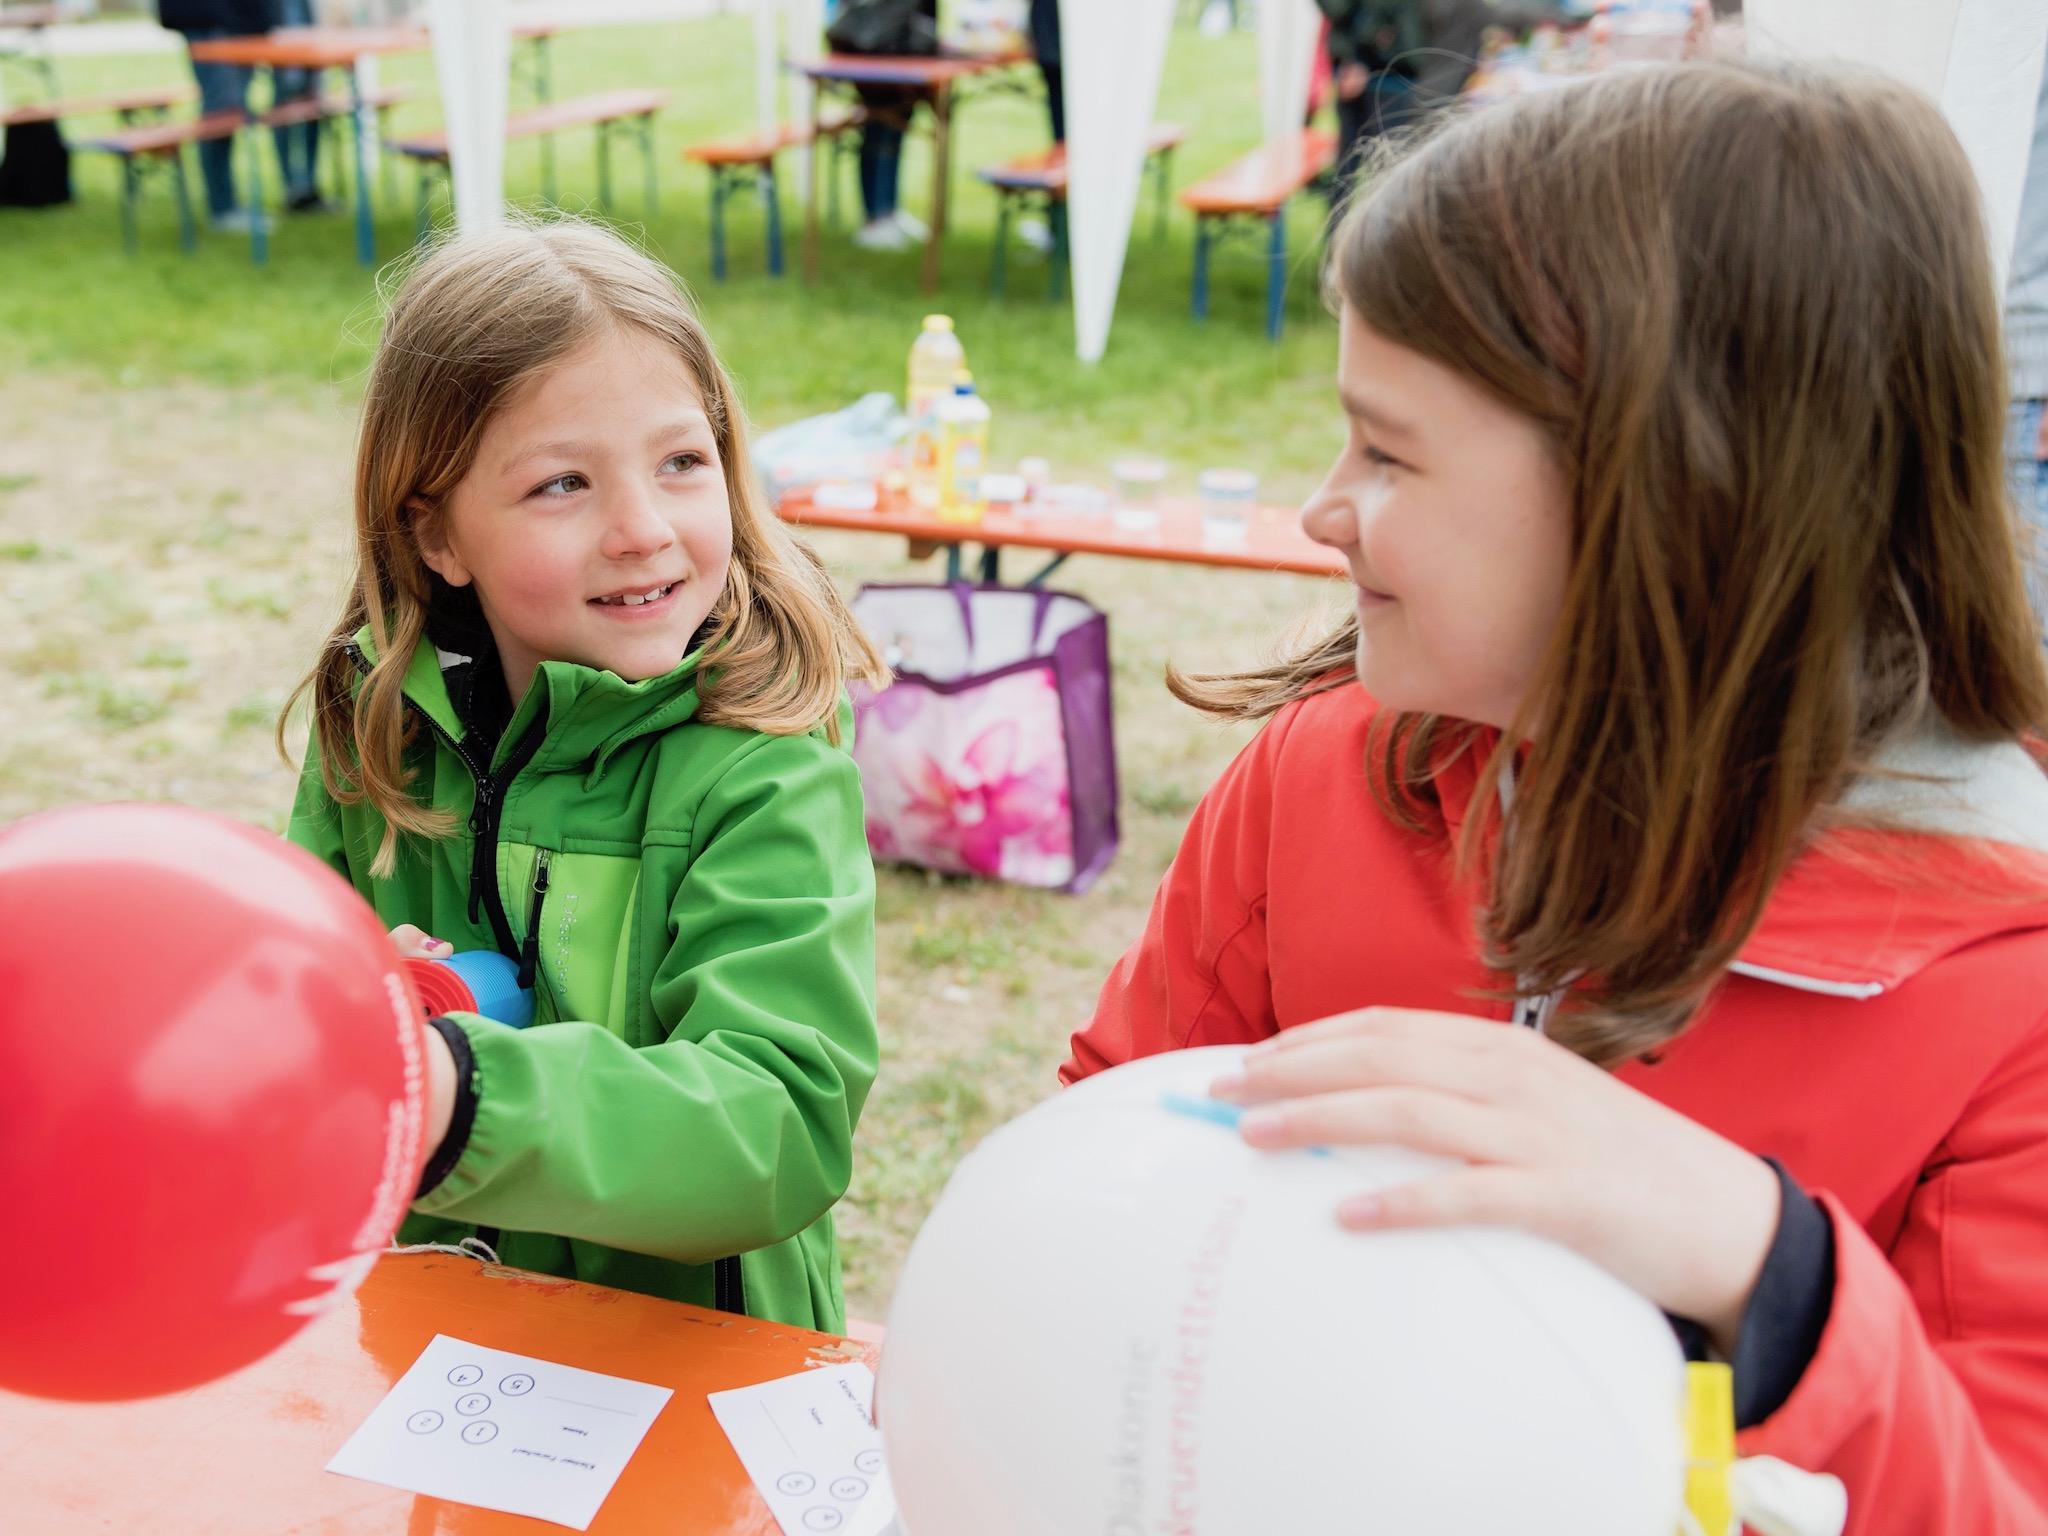 Das Kinderprogramm ist bunt und vielfältig. Foto: www.uwe-niklas.com 2018